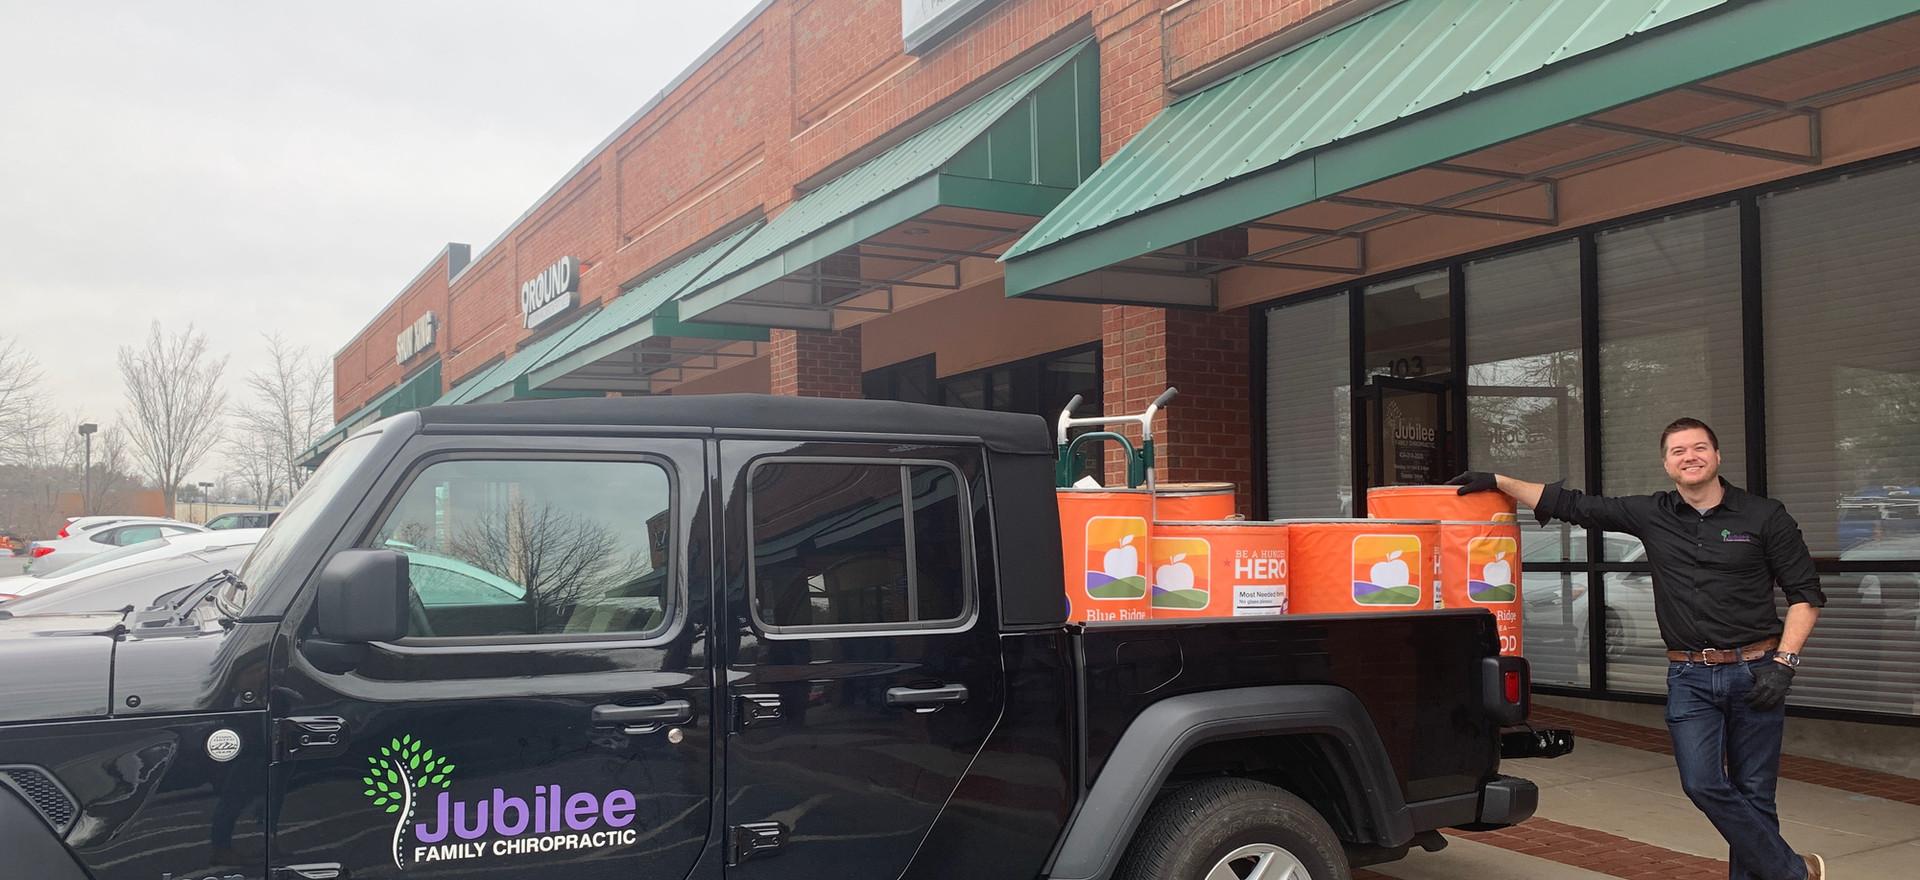 Jubilee Family Chiropractic 2020 Blue Ridge Food Drive. 006